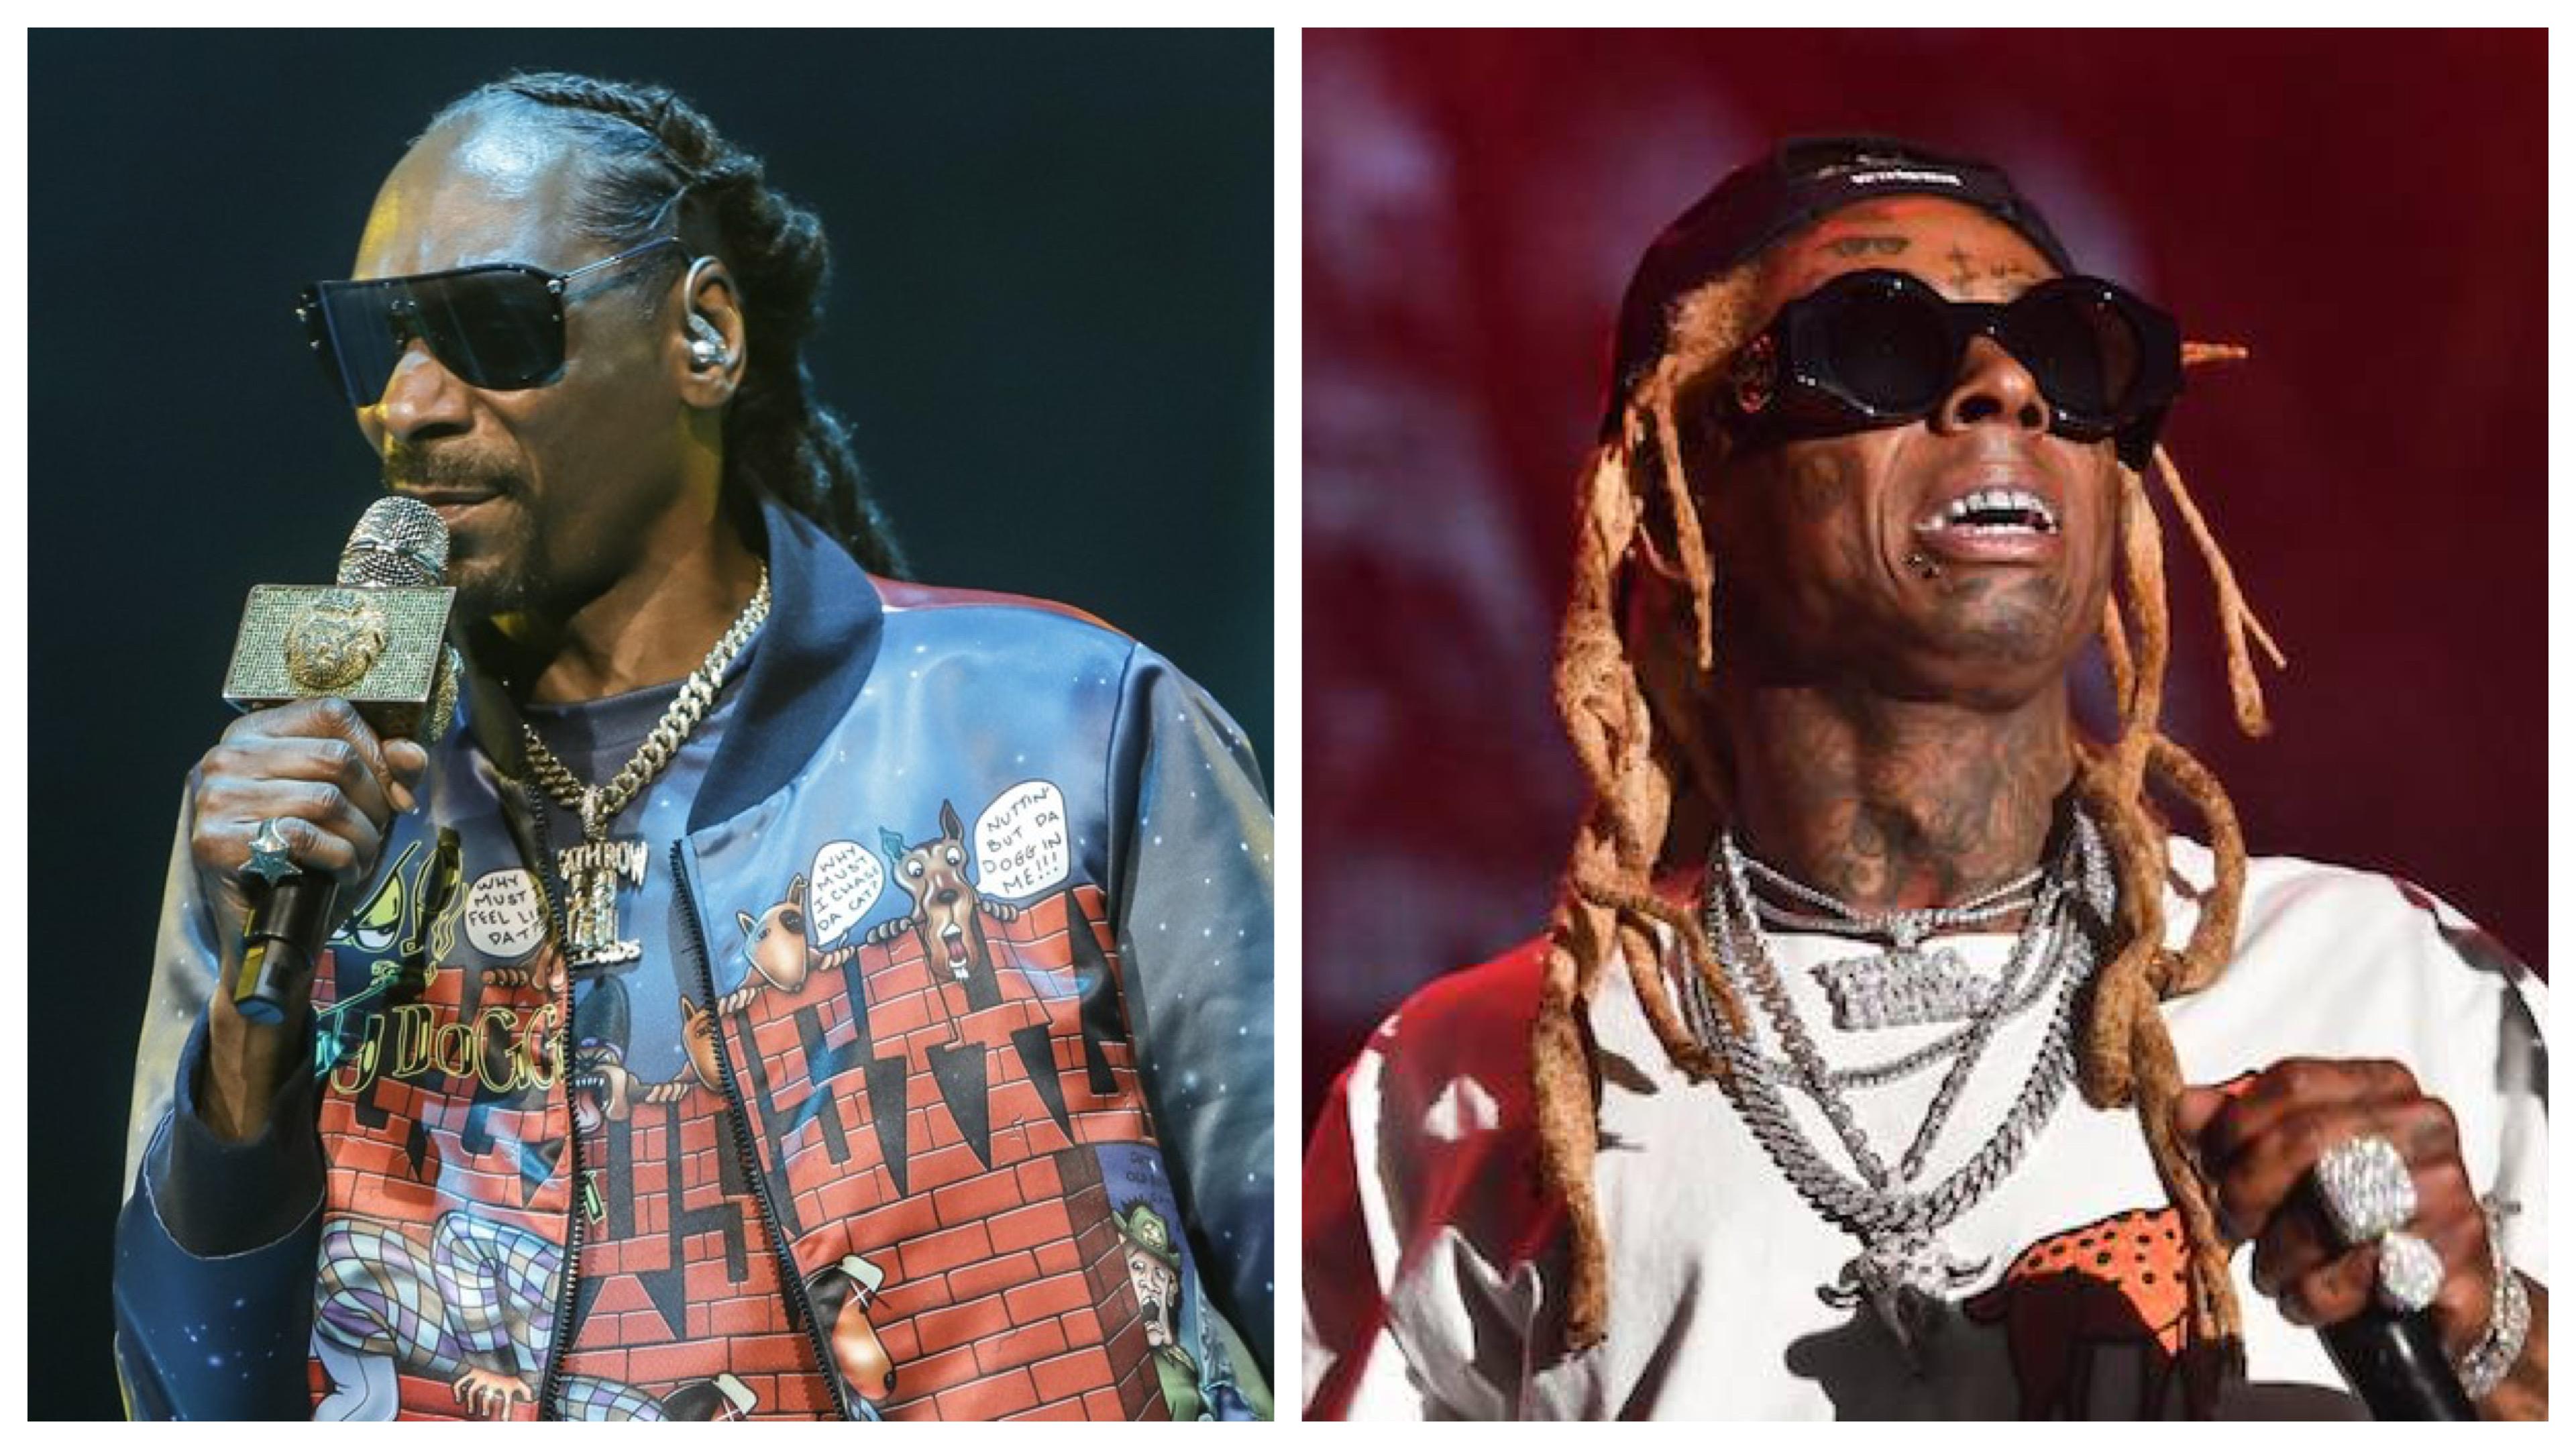 Snoop Dogg and Lil Wayne